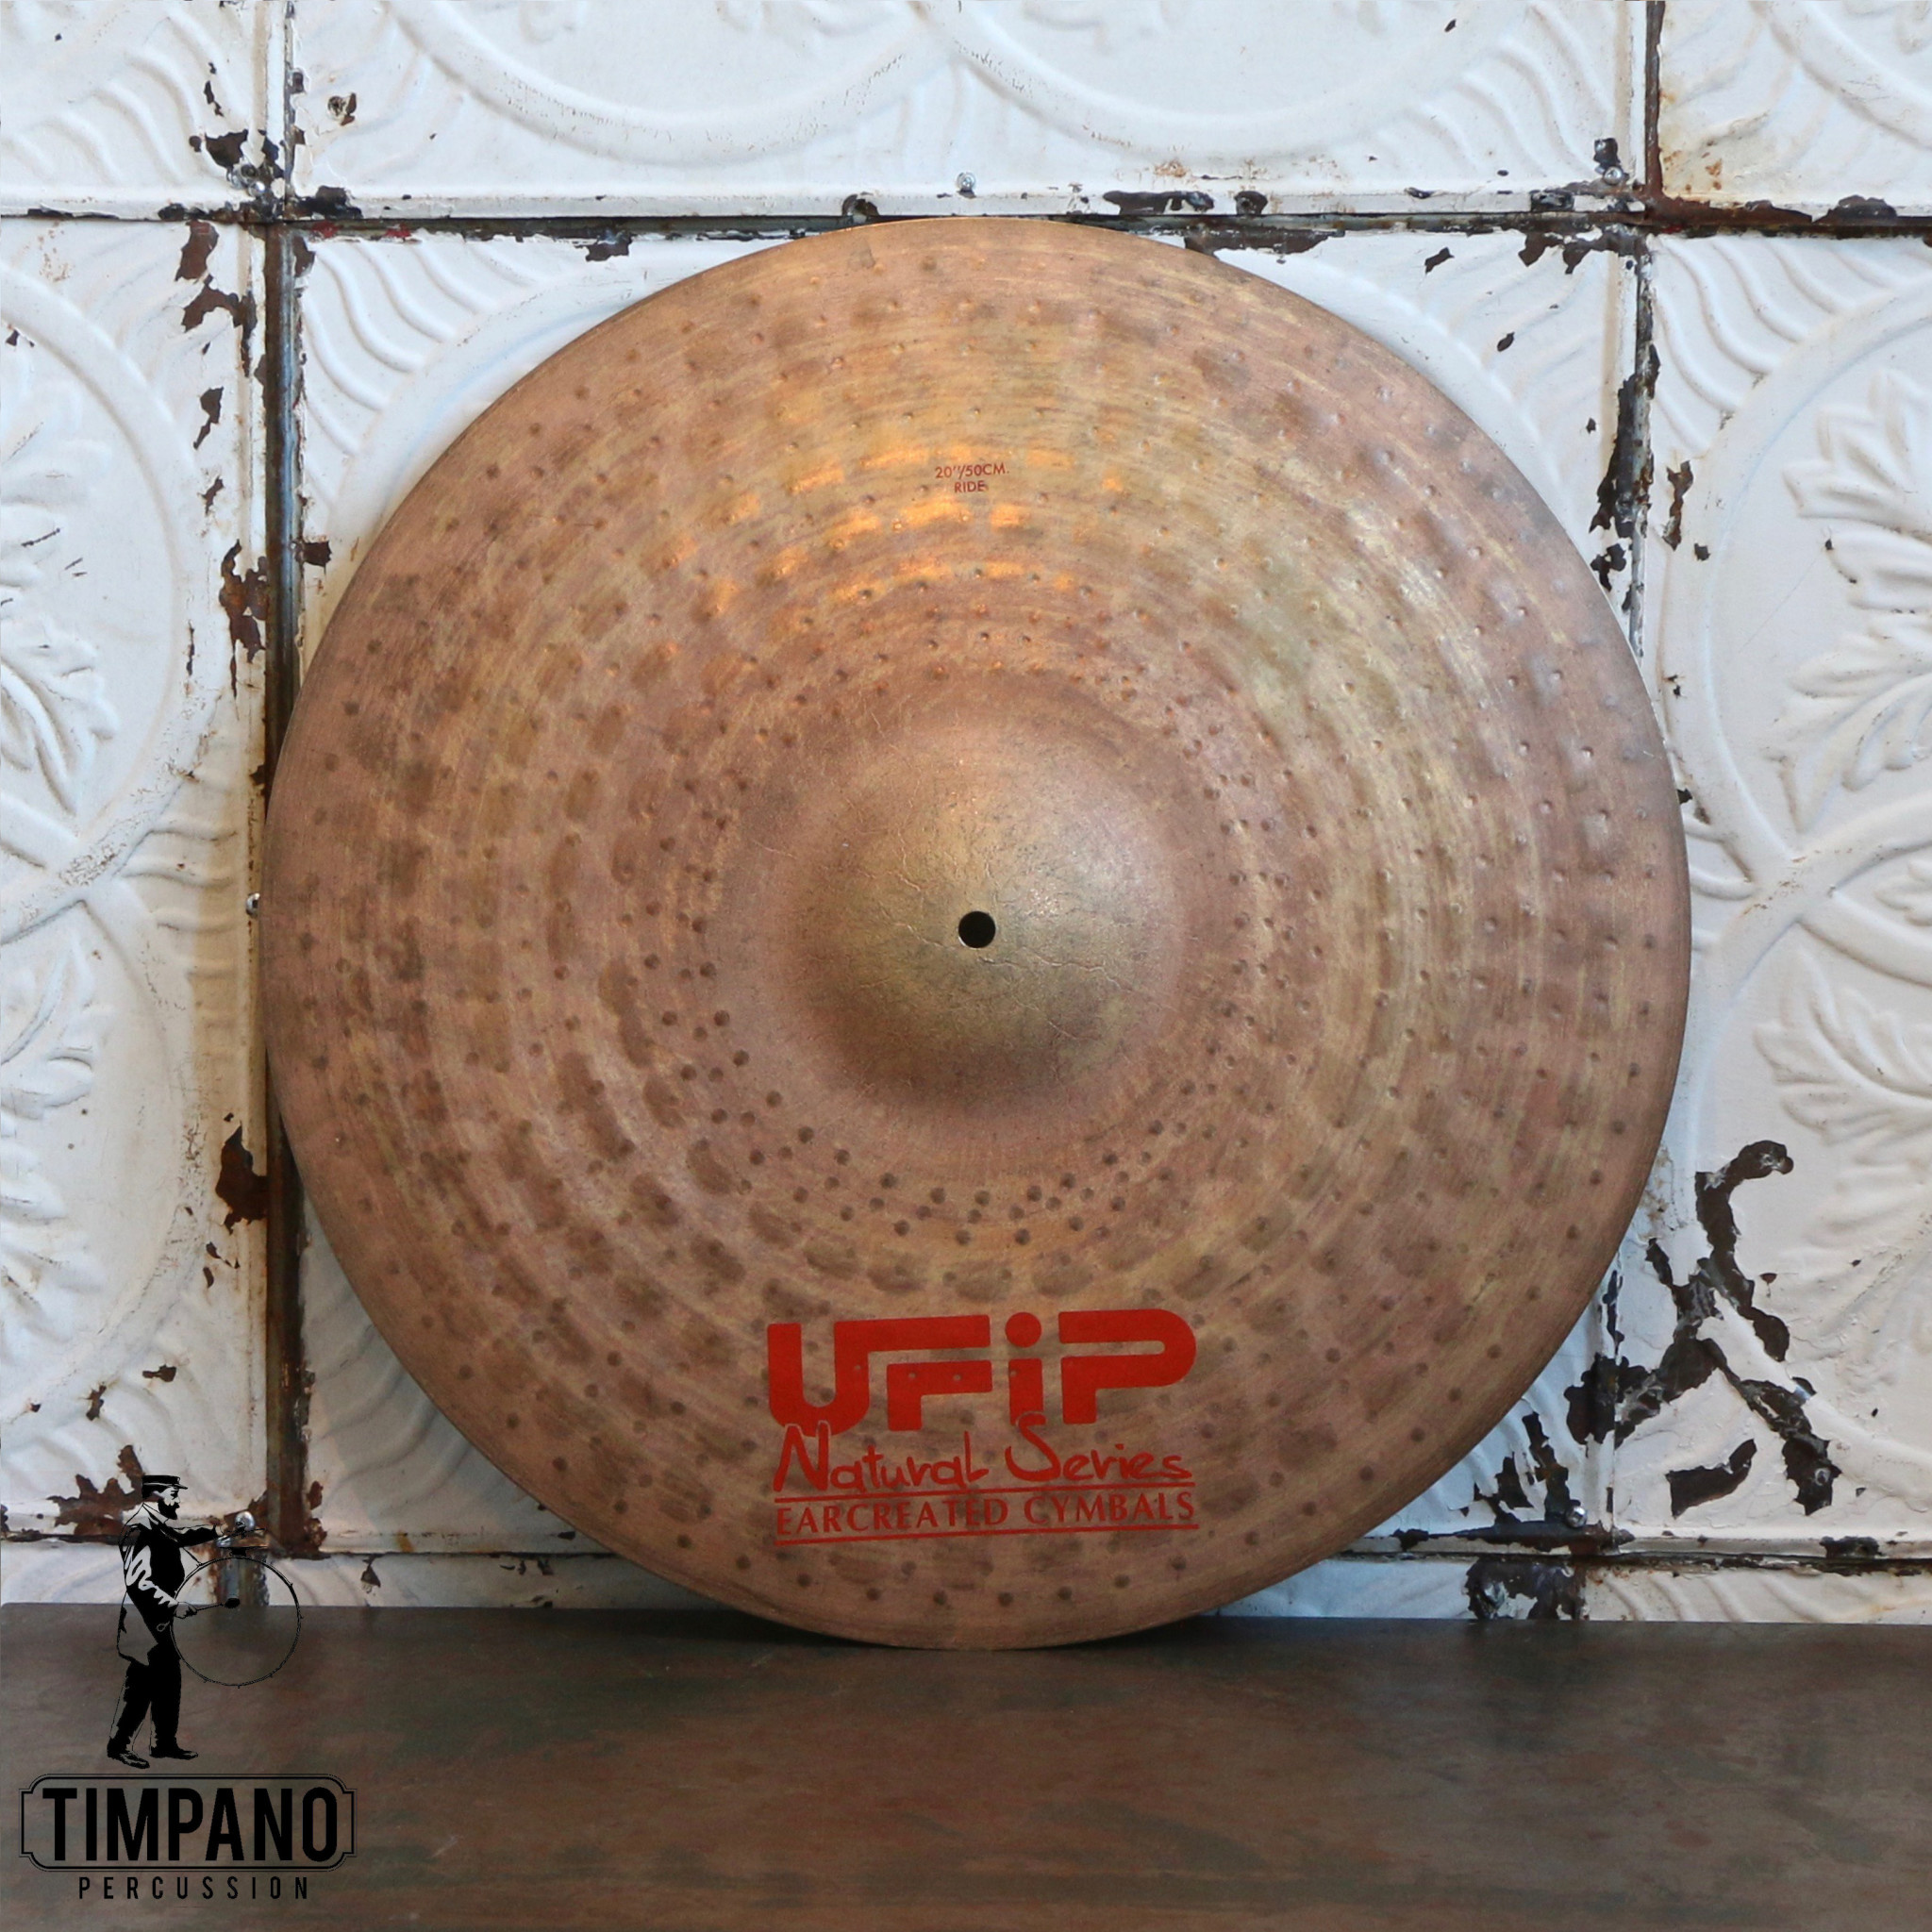 U-FIP UfiP Natural Medium Ride Cymbal 20in